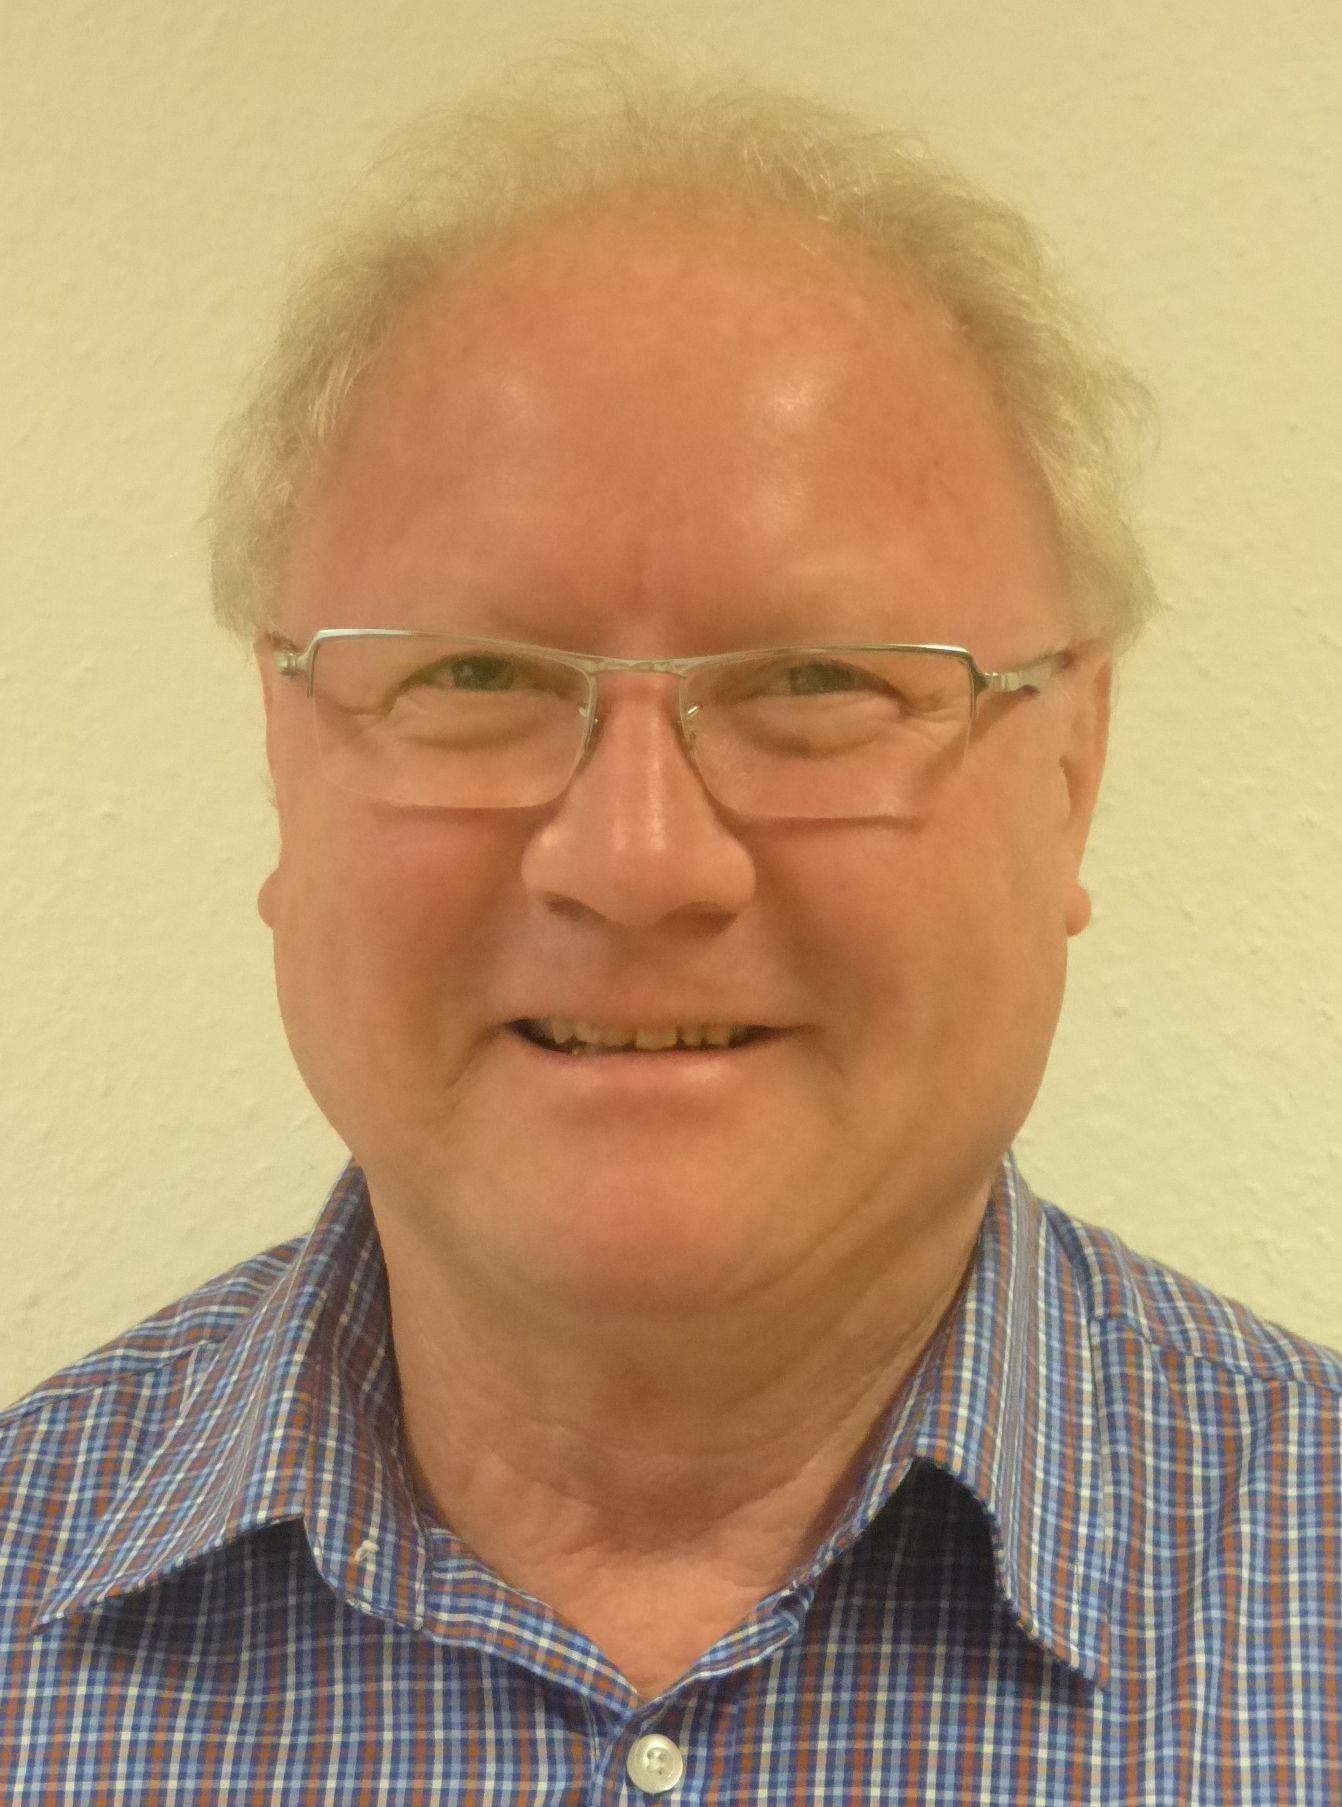 Josef Ege